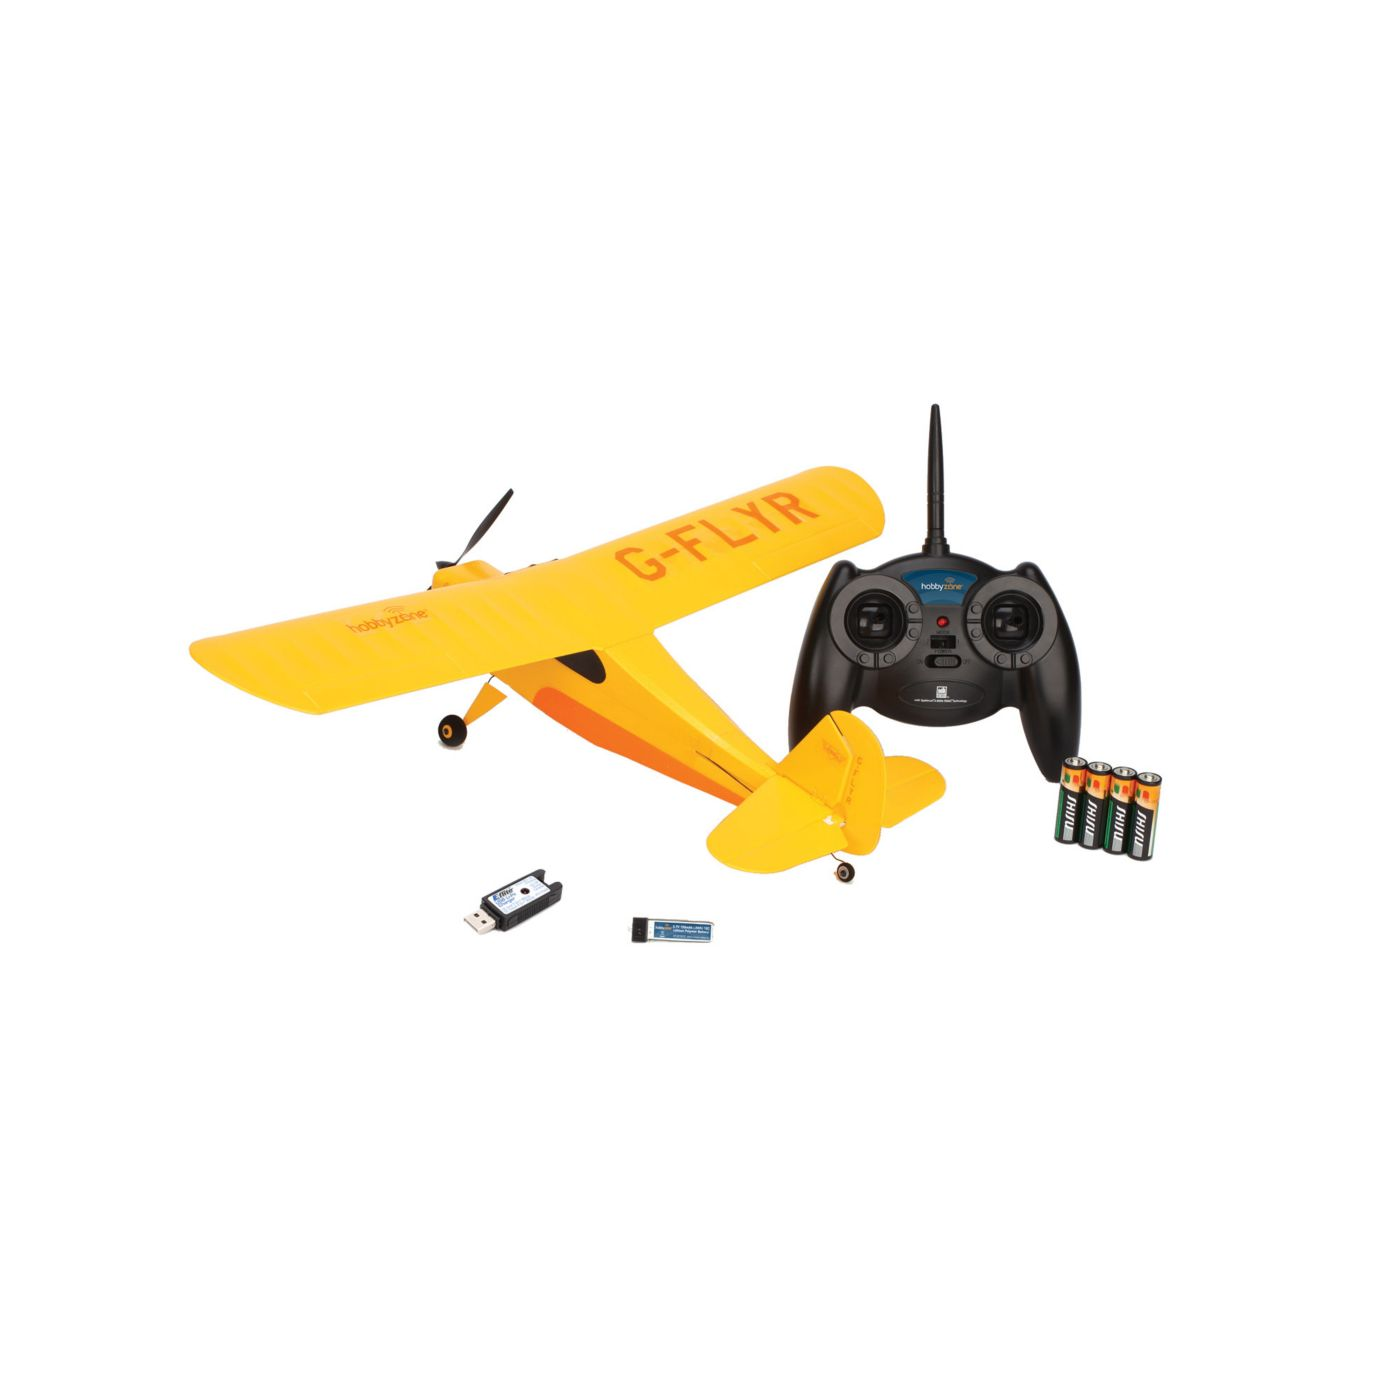 HobbyZone HBZ4931 Complete Tail Champ